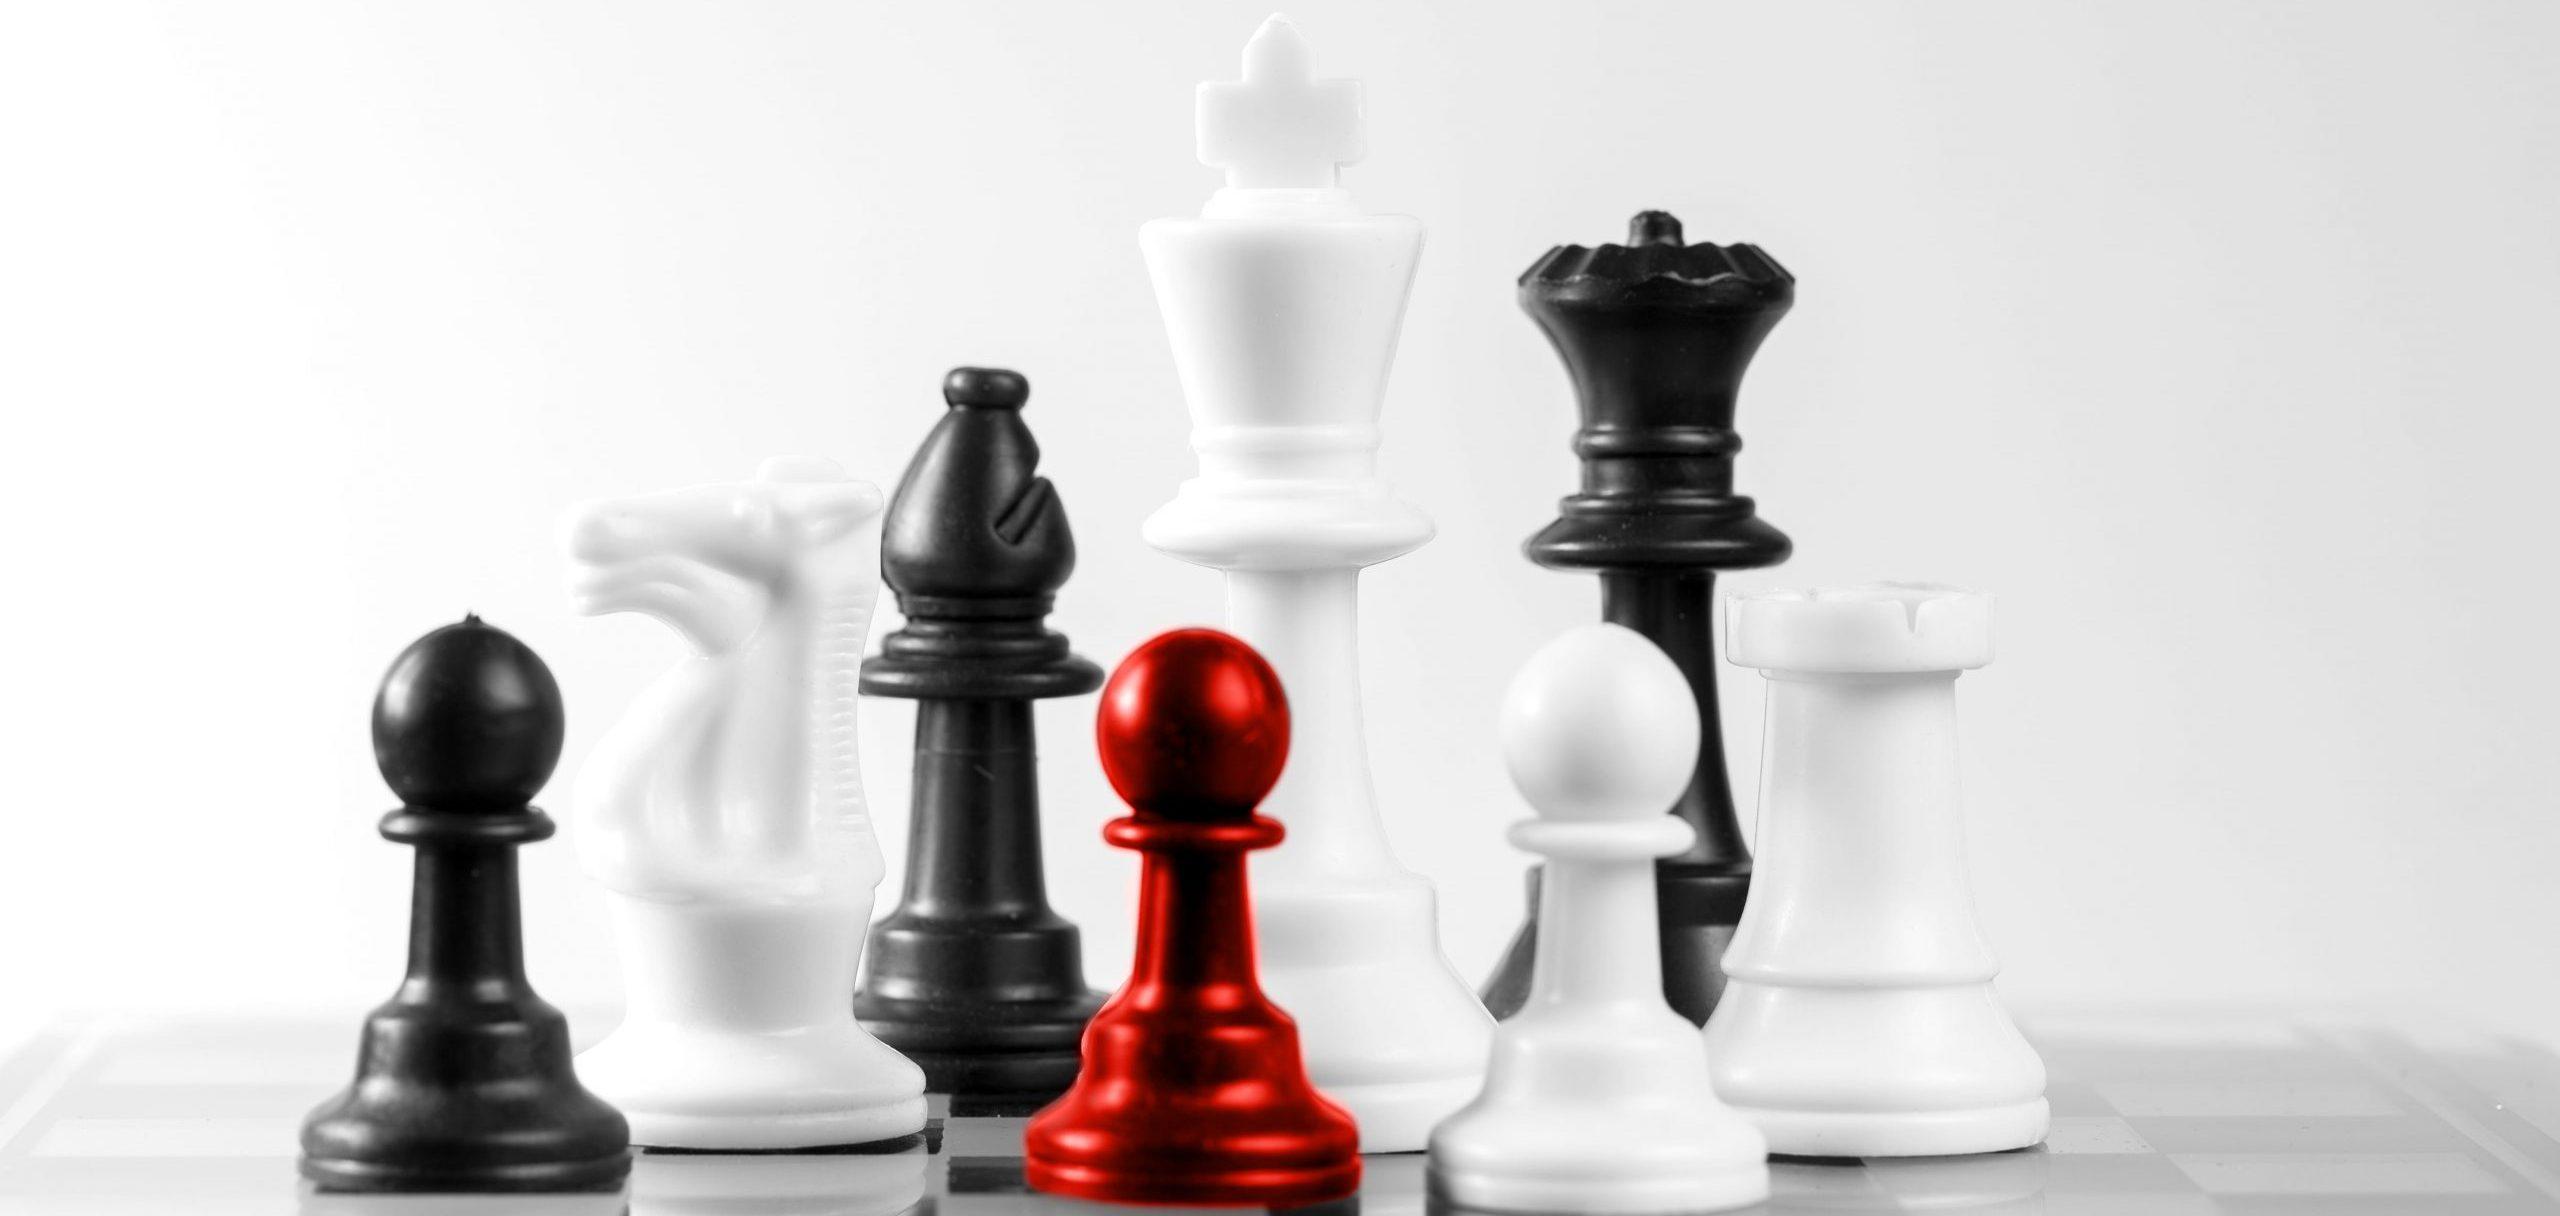 https://mjmeurope.com/media/2020/07/Business-Strategy-Image2-min-scaled-e1609408634382.jpg